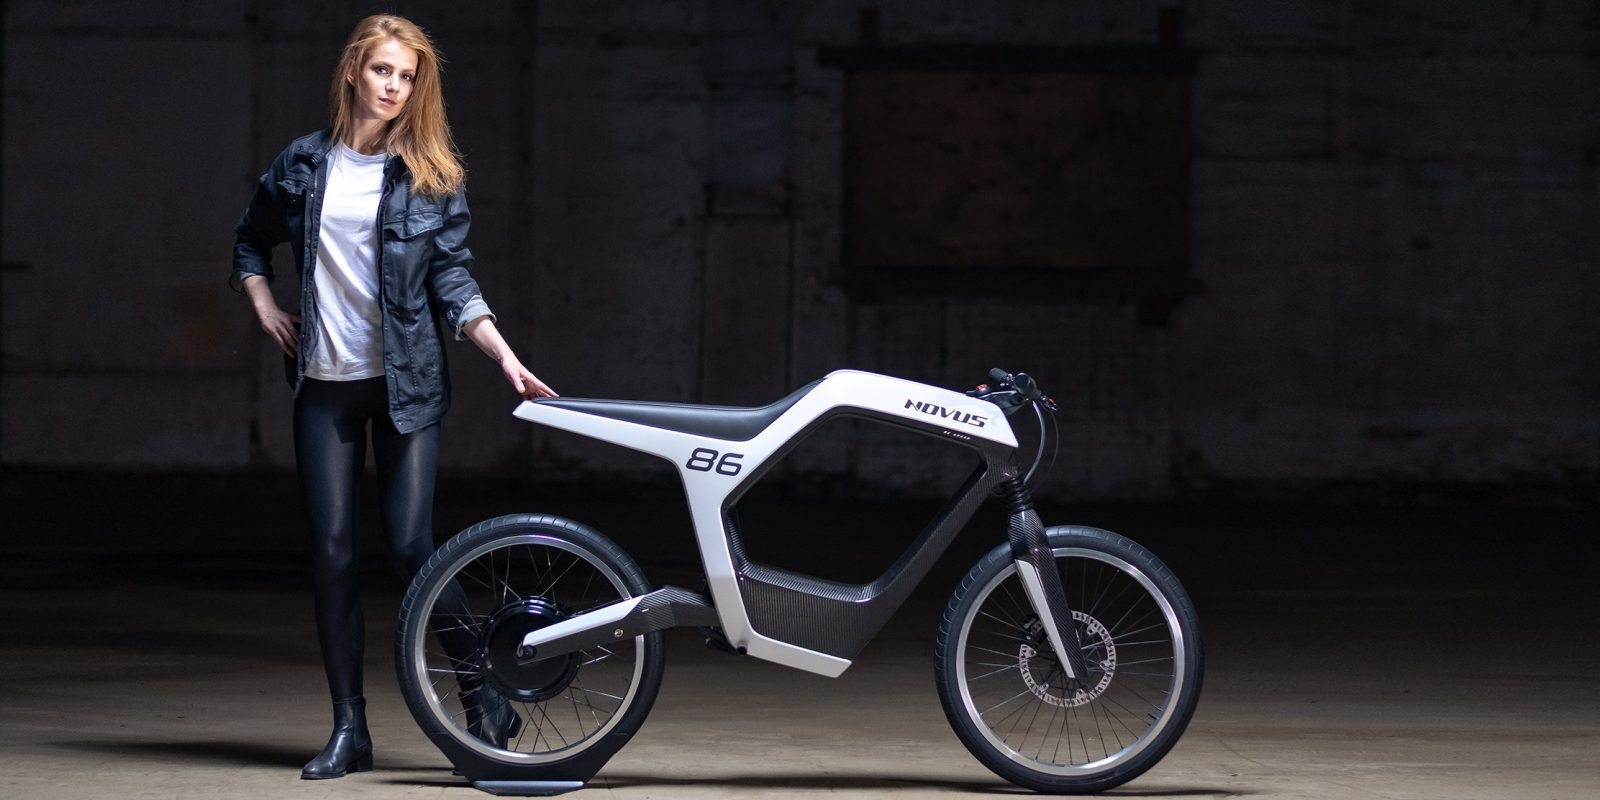 Novus Electric Motorcycle Has Stunning Frame But Knocks